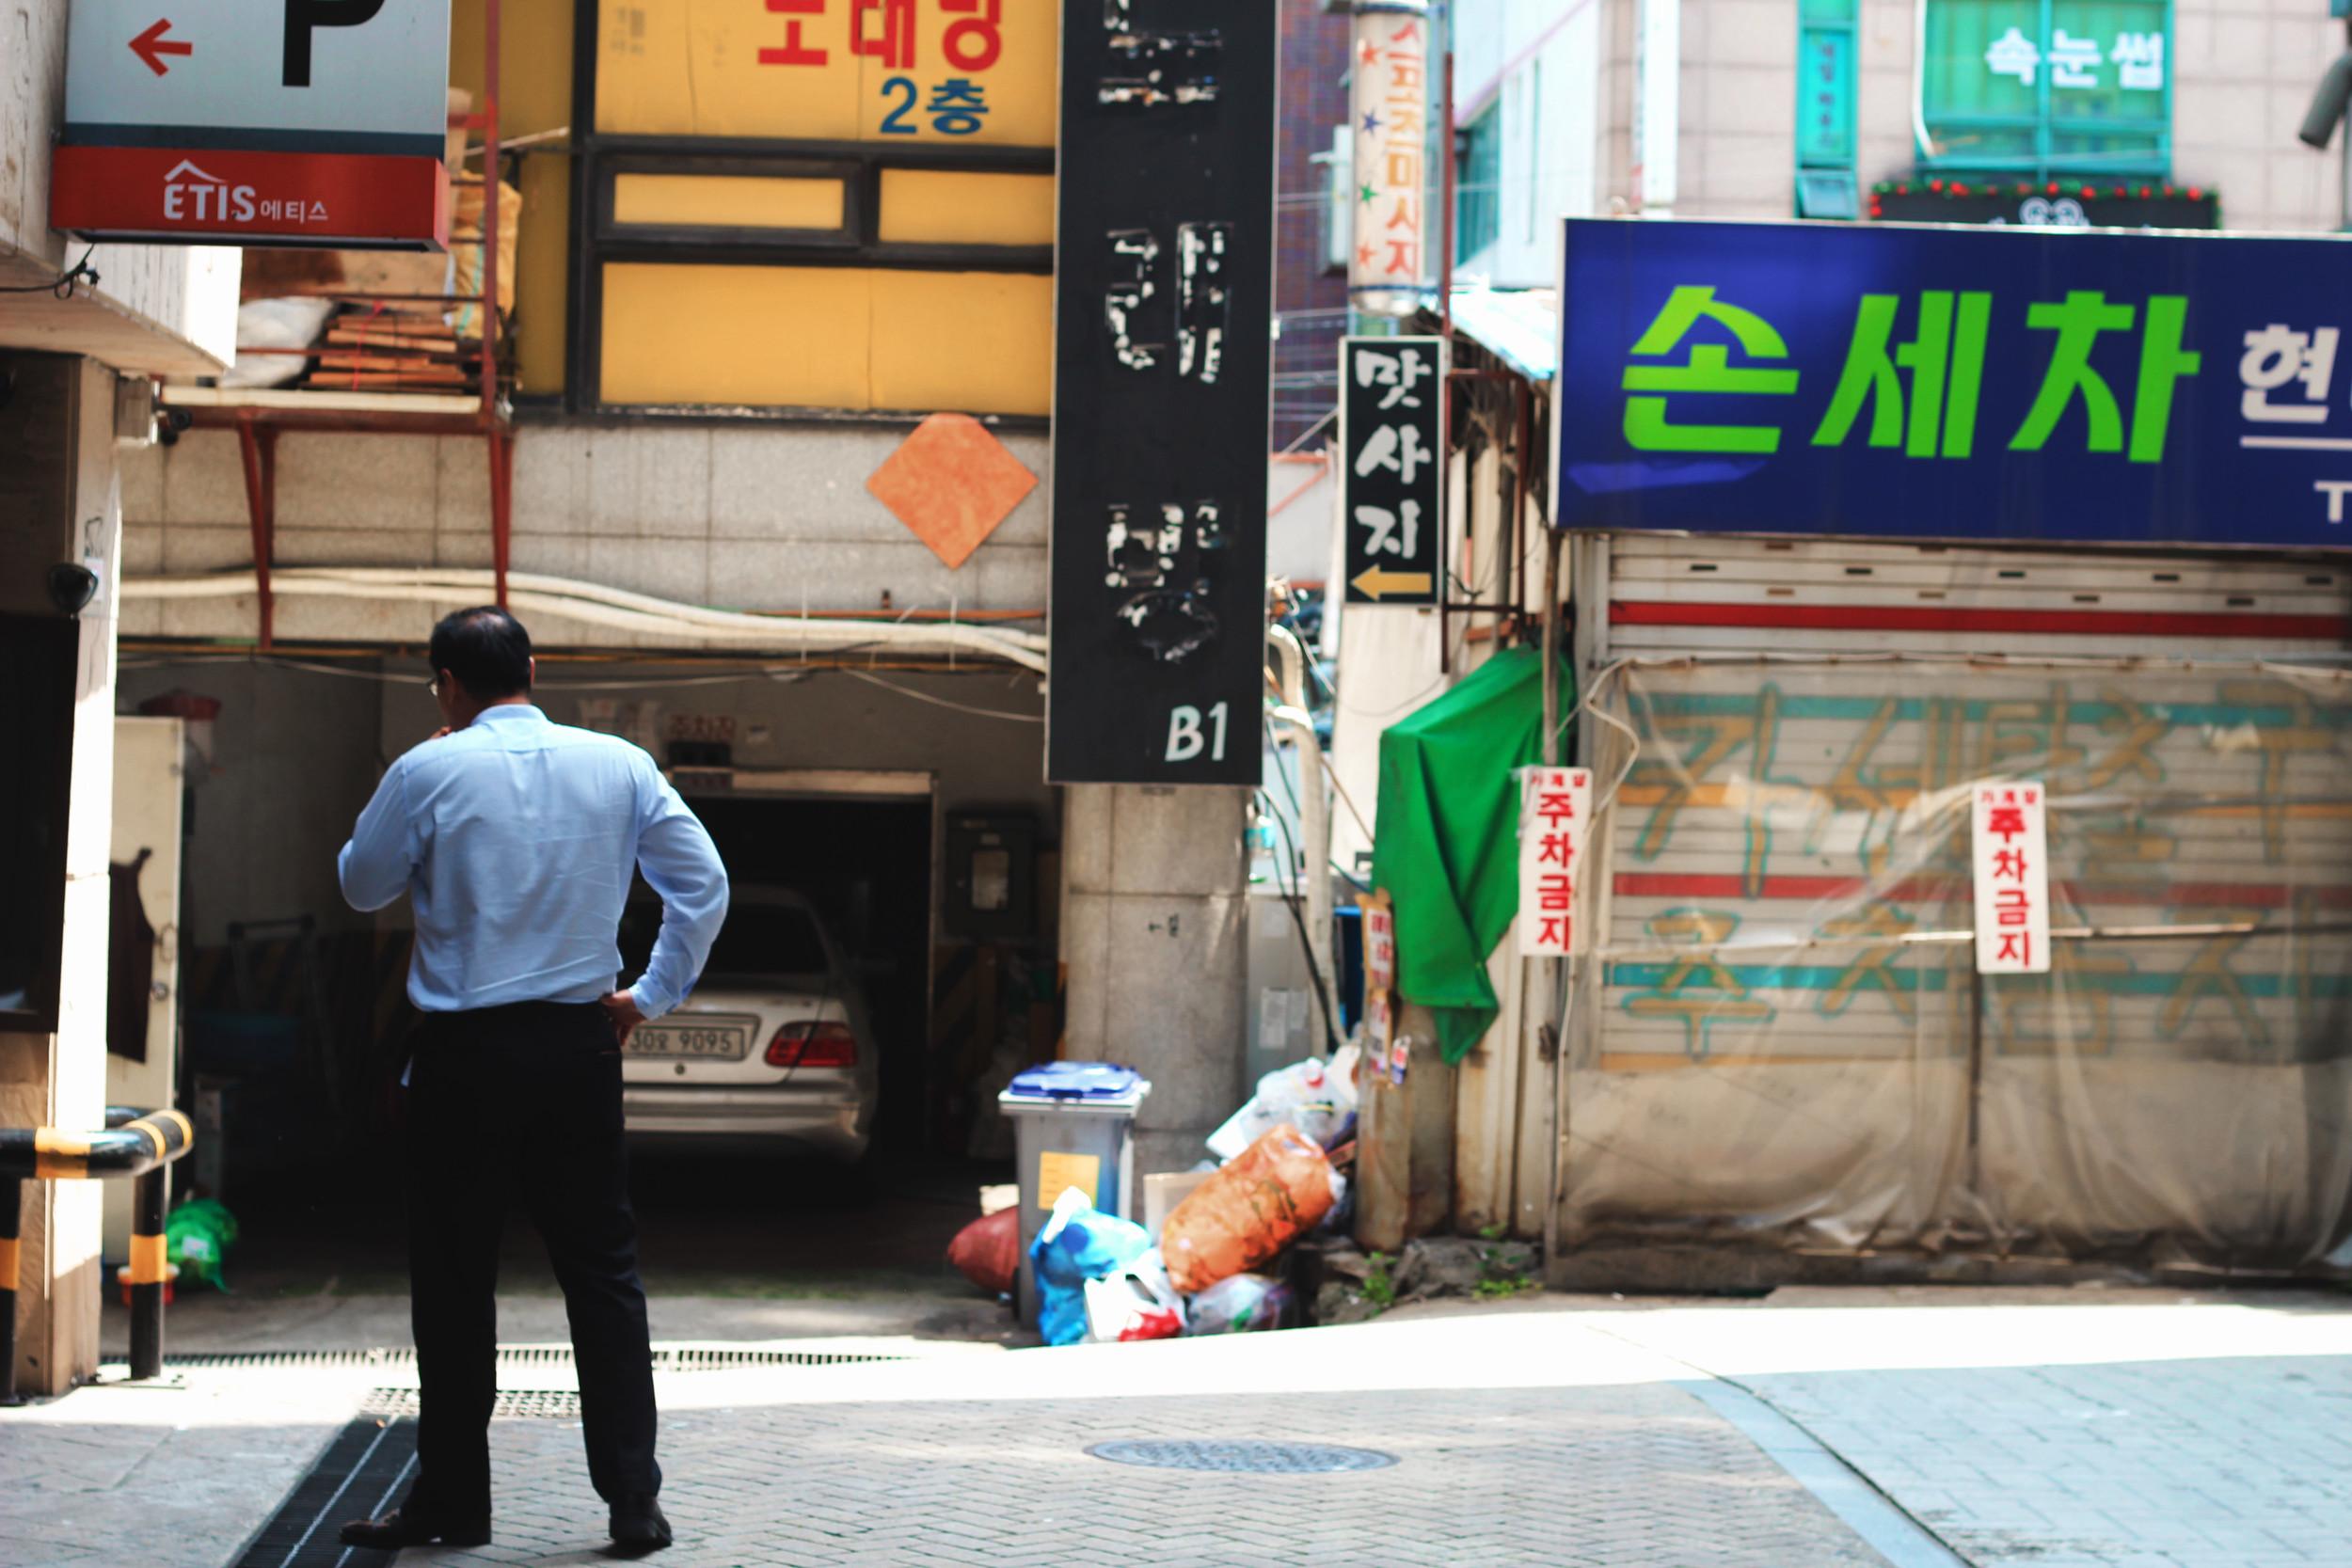 seoul street.jpg